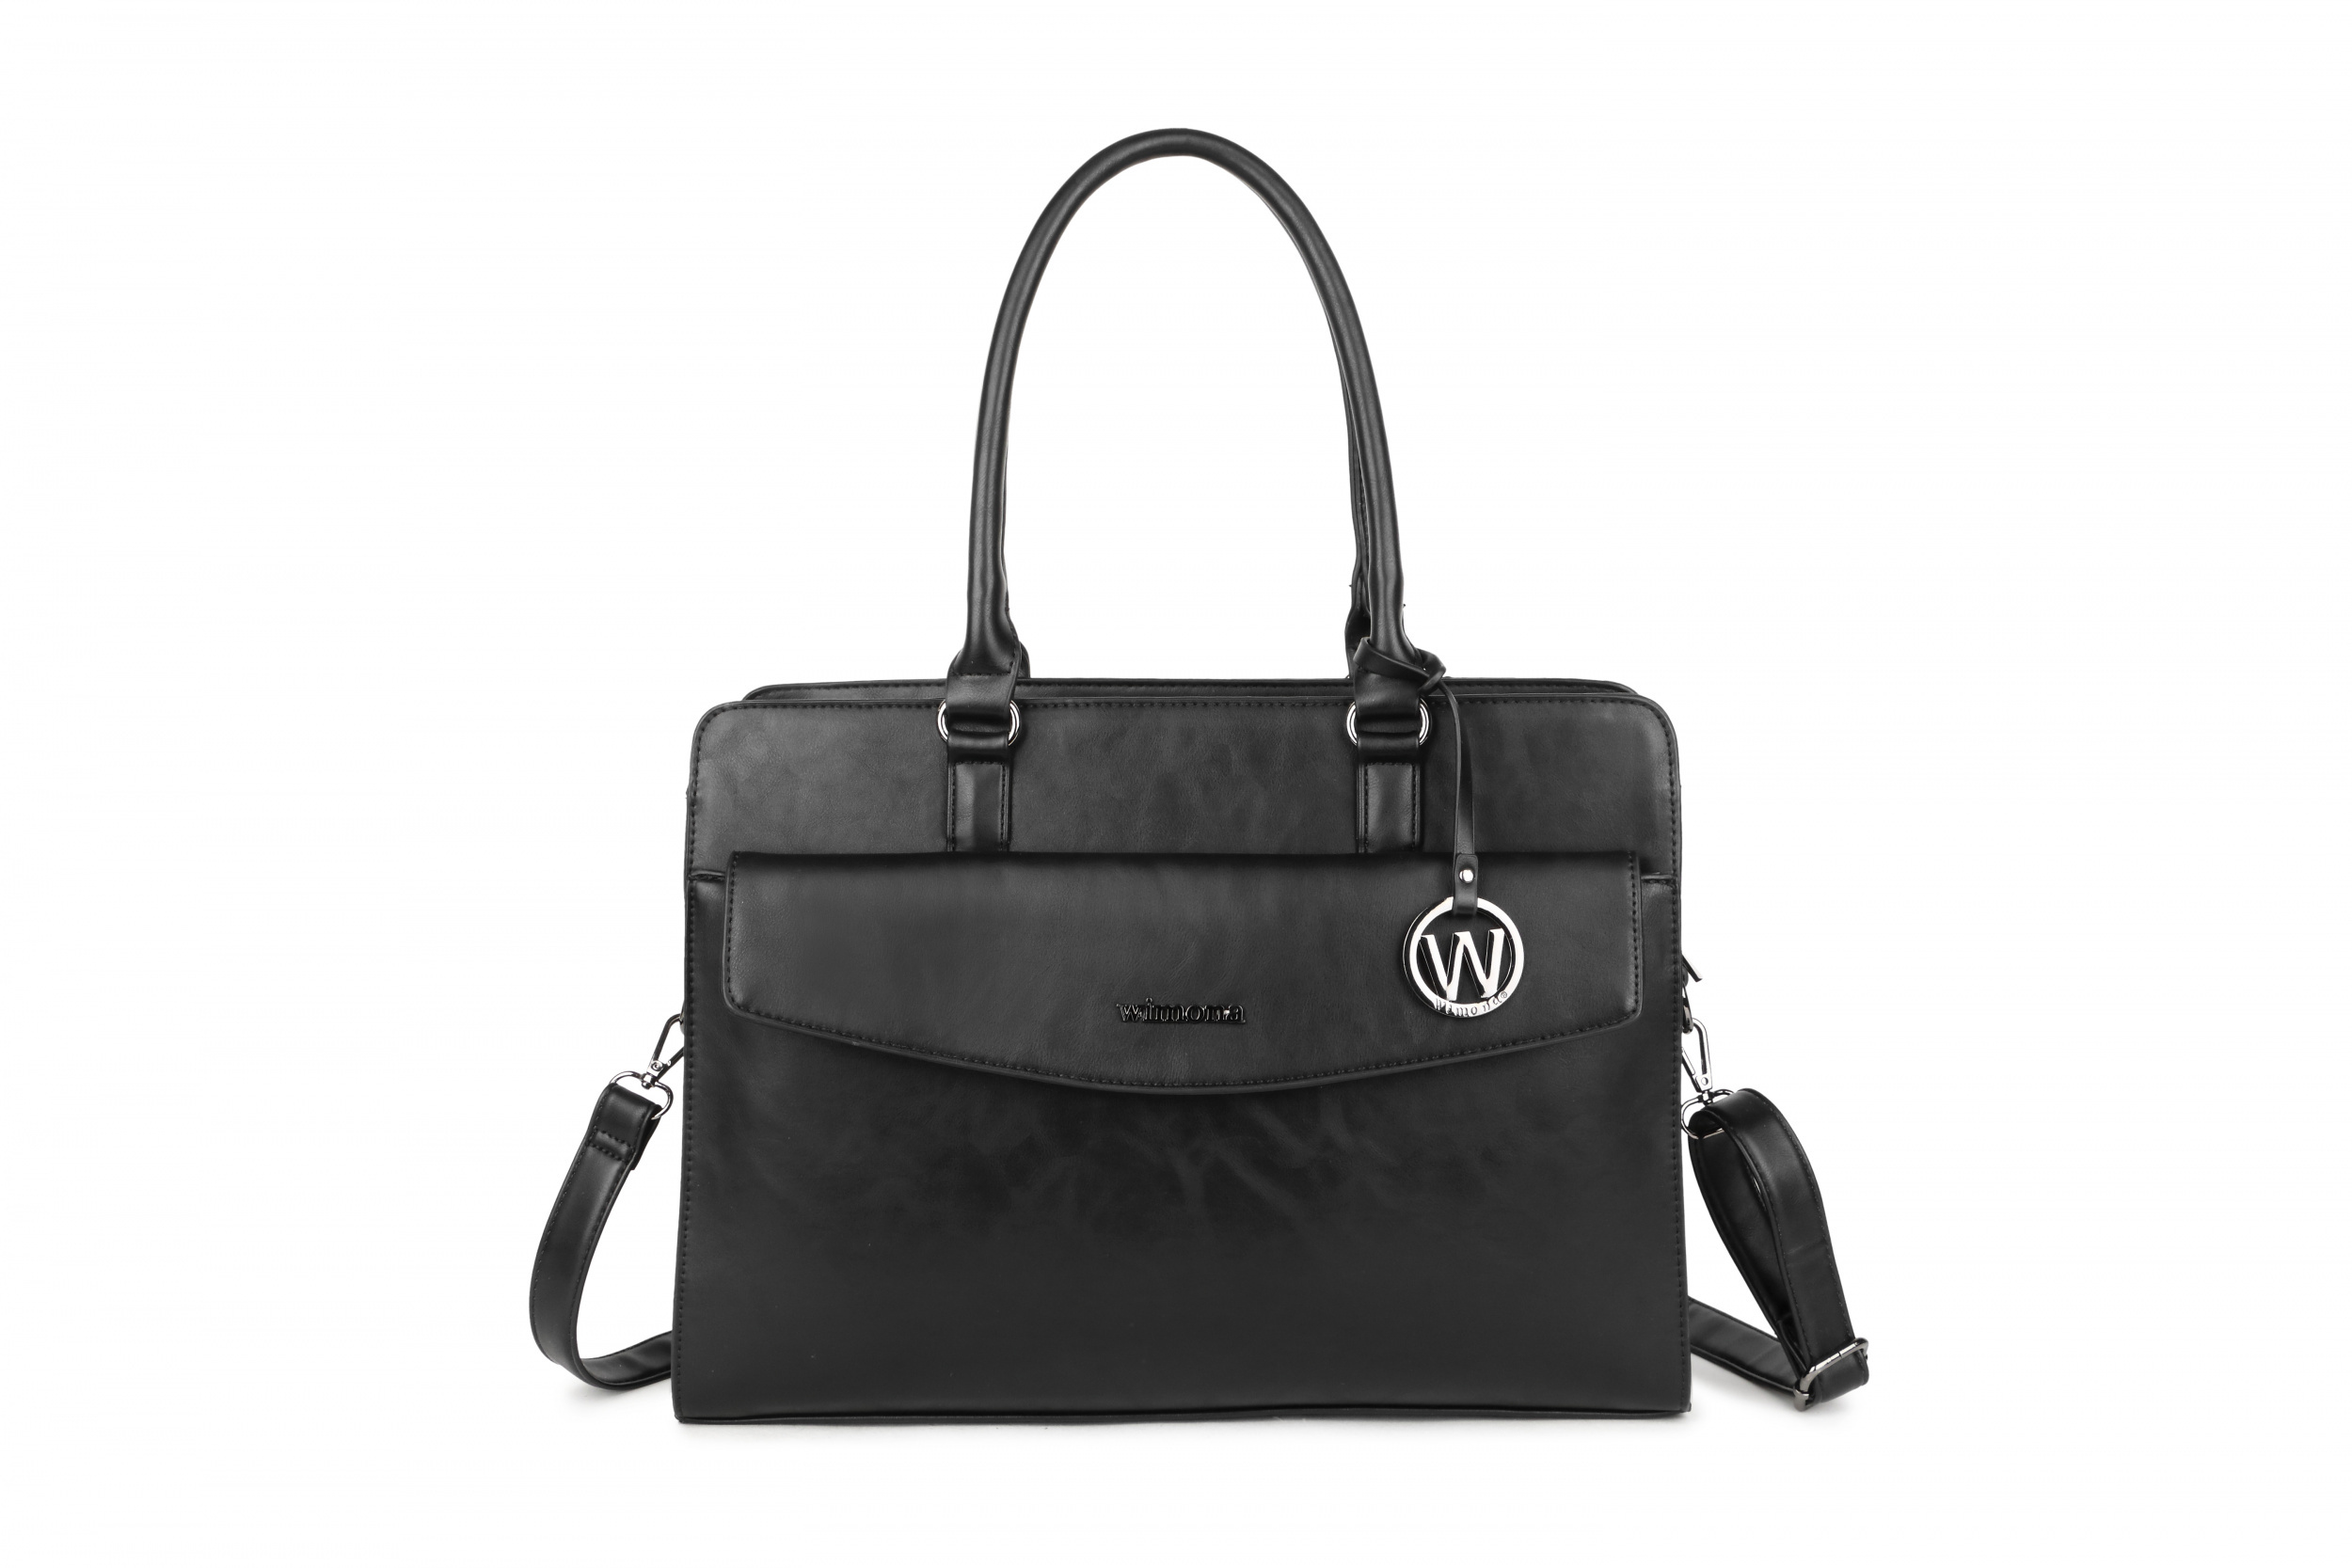 Wimona Bags Valentina Laptoptas 1180 Zwart